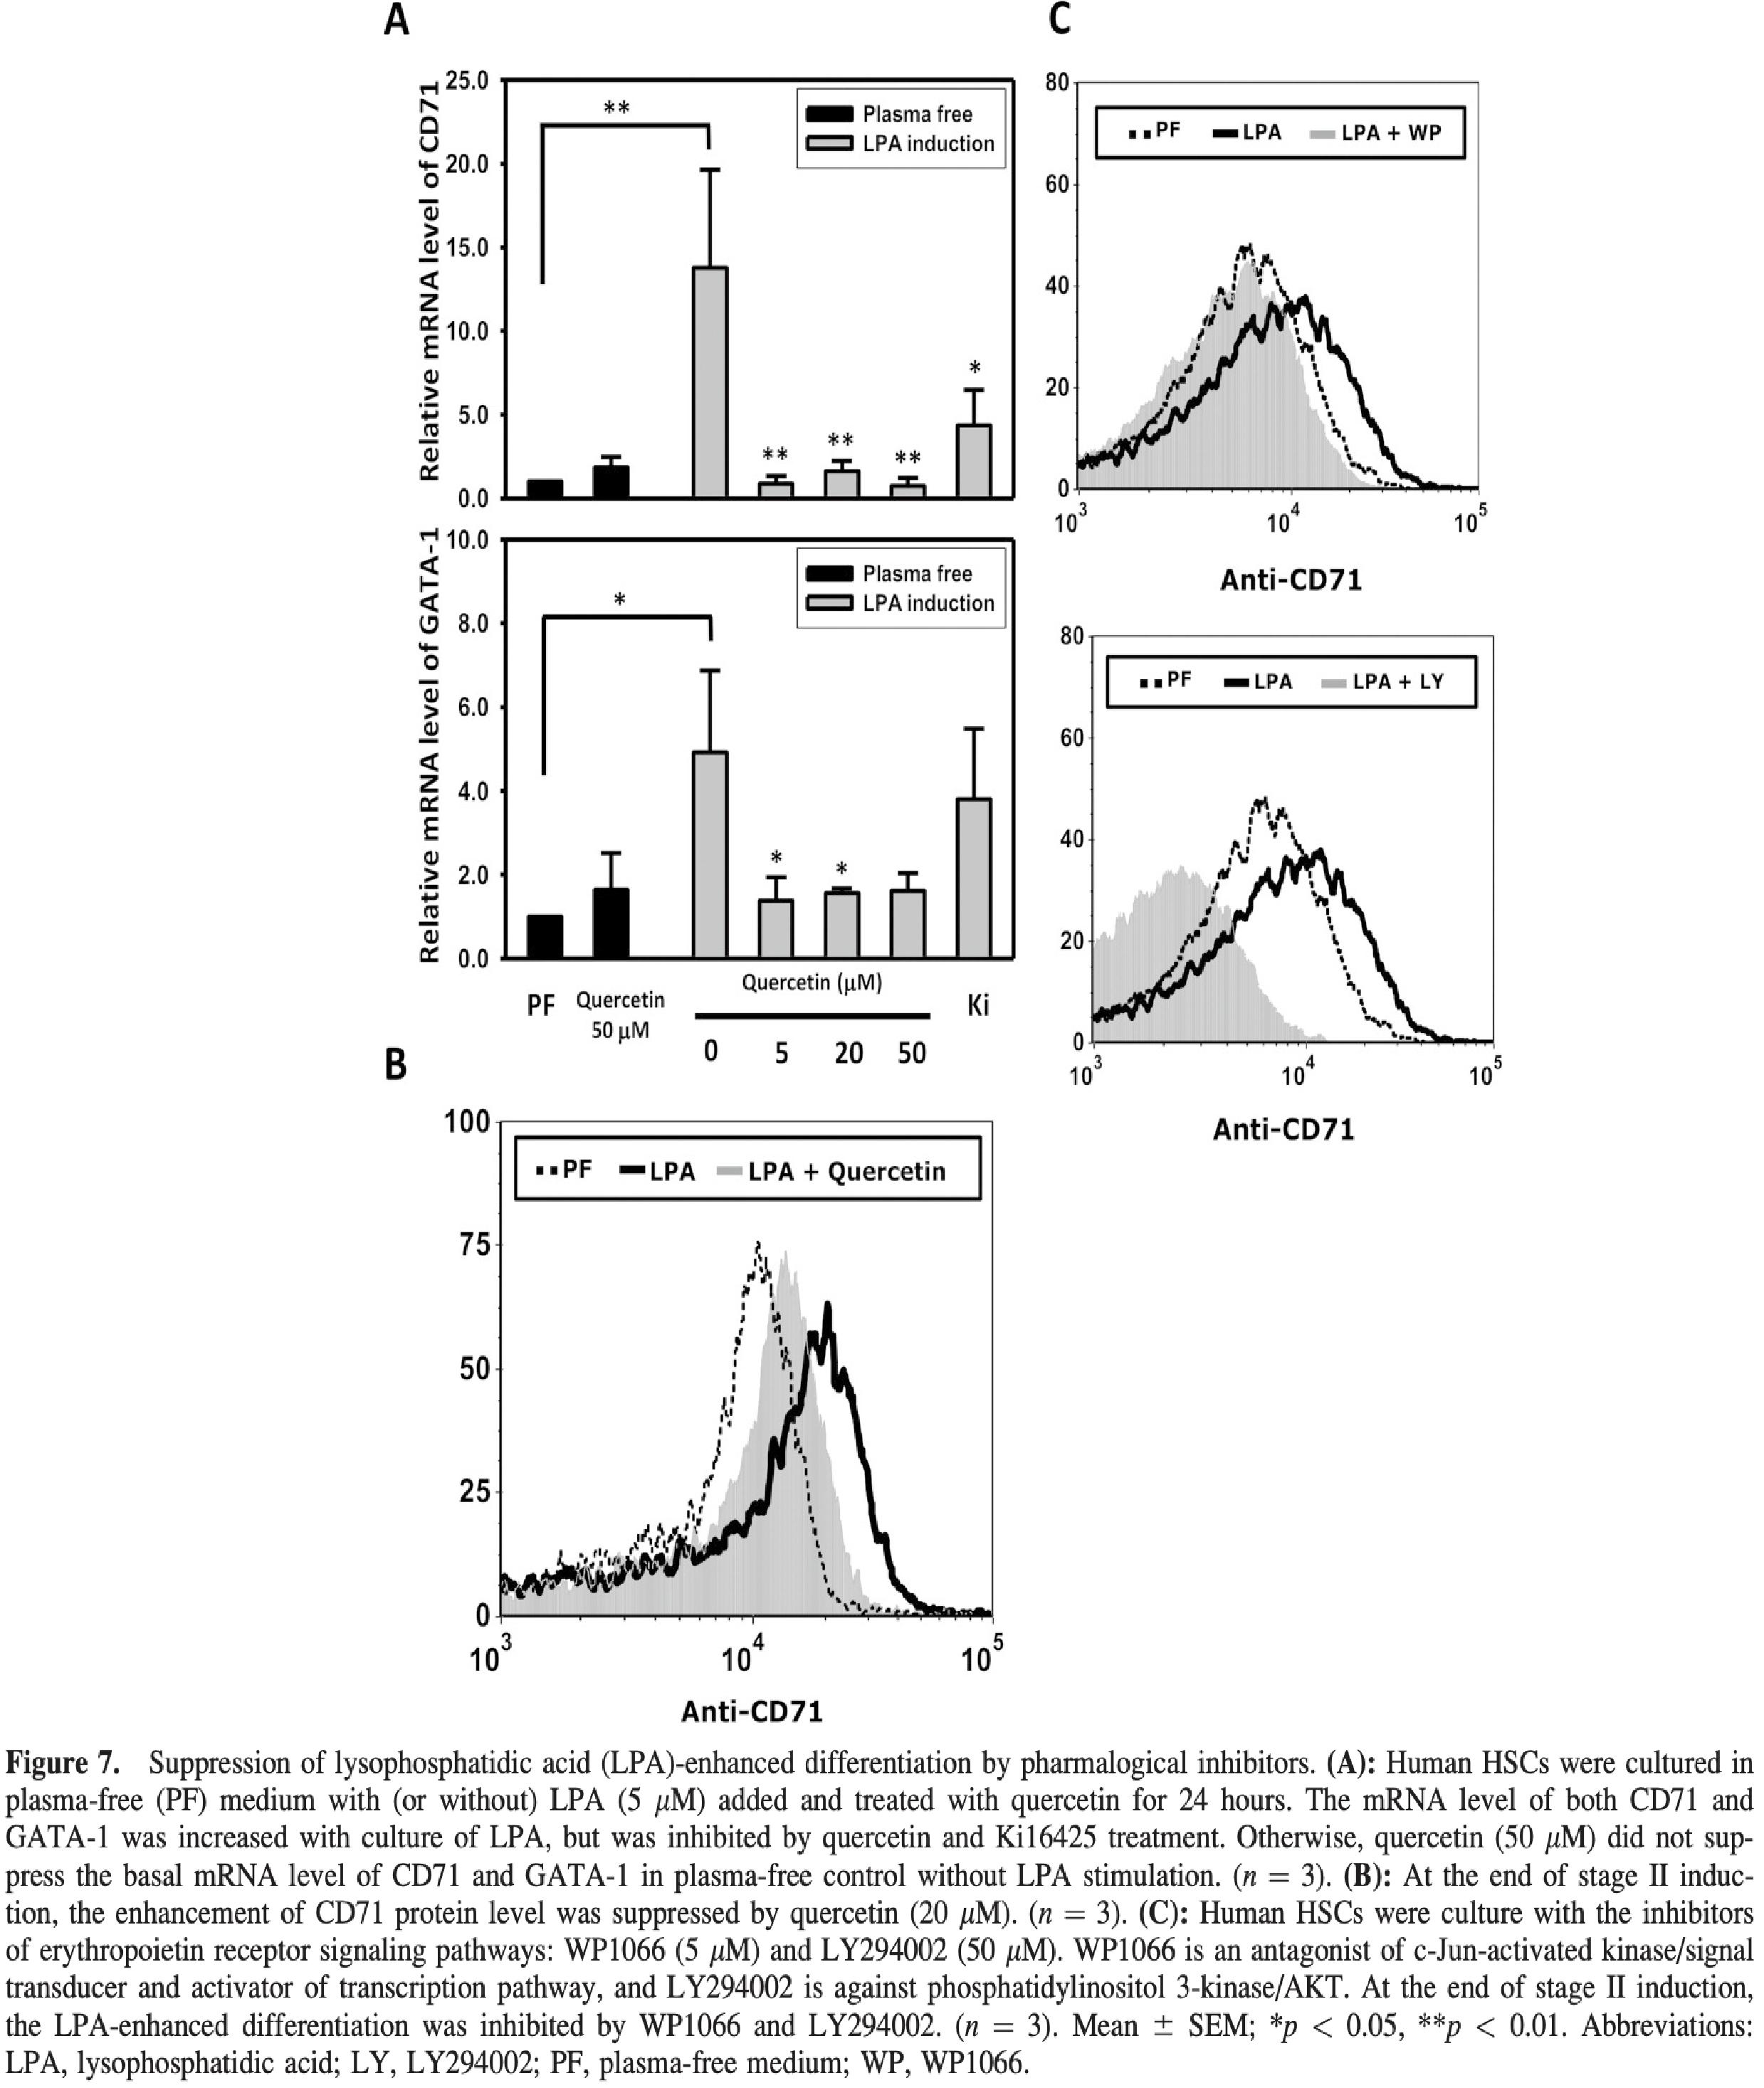 LPA經由其下游之訊息傳遞路徑影響紅血球生成